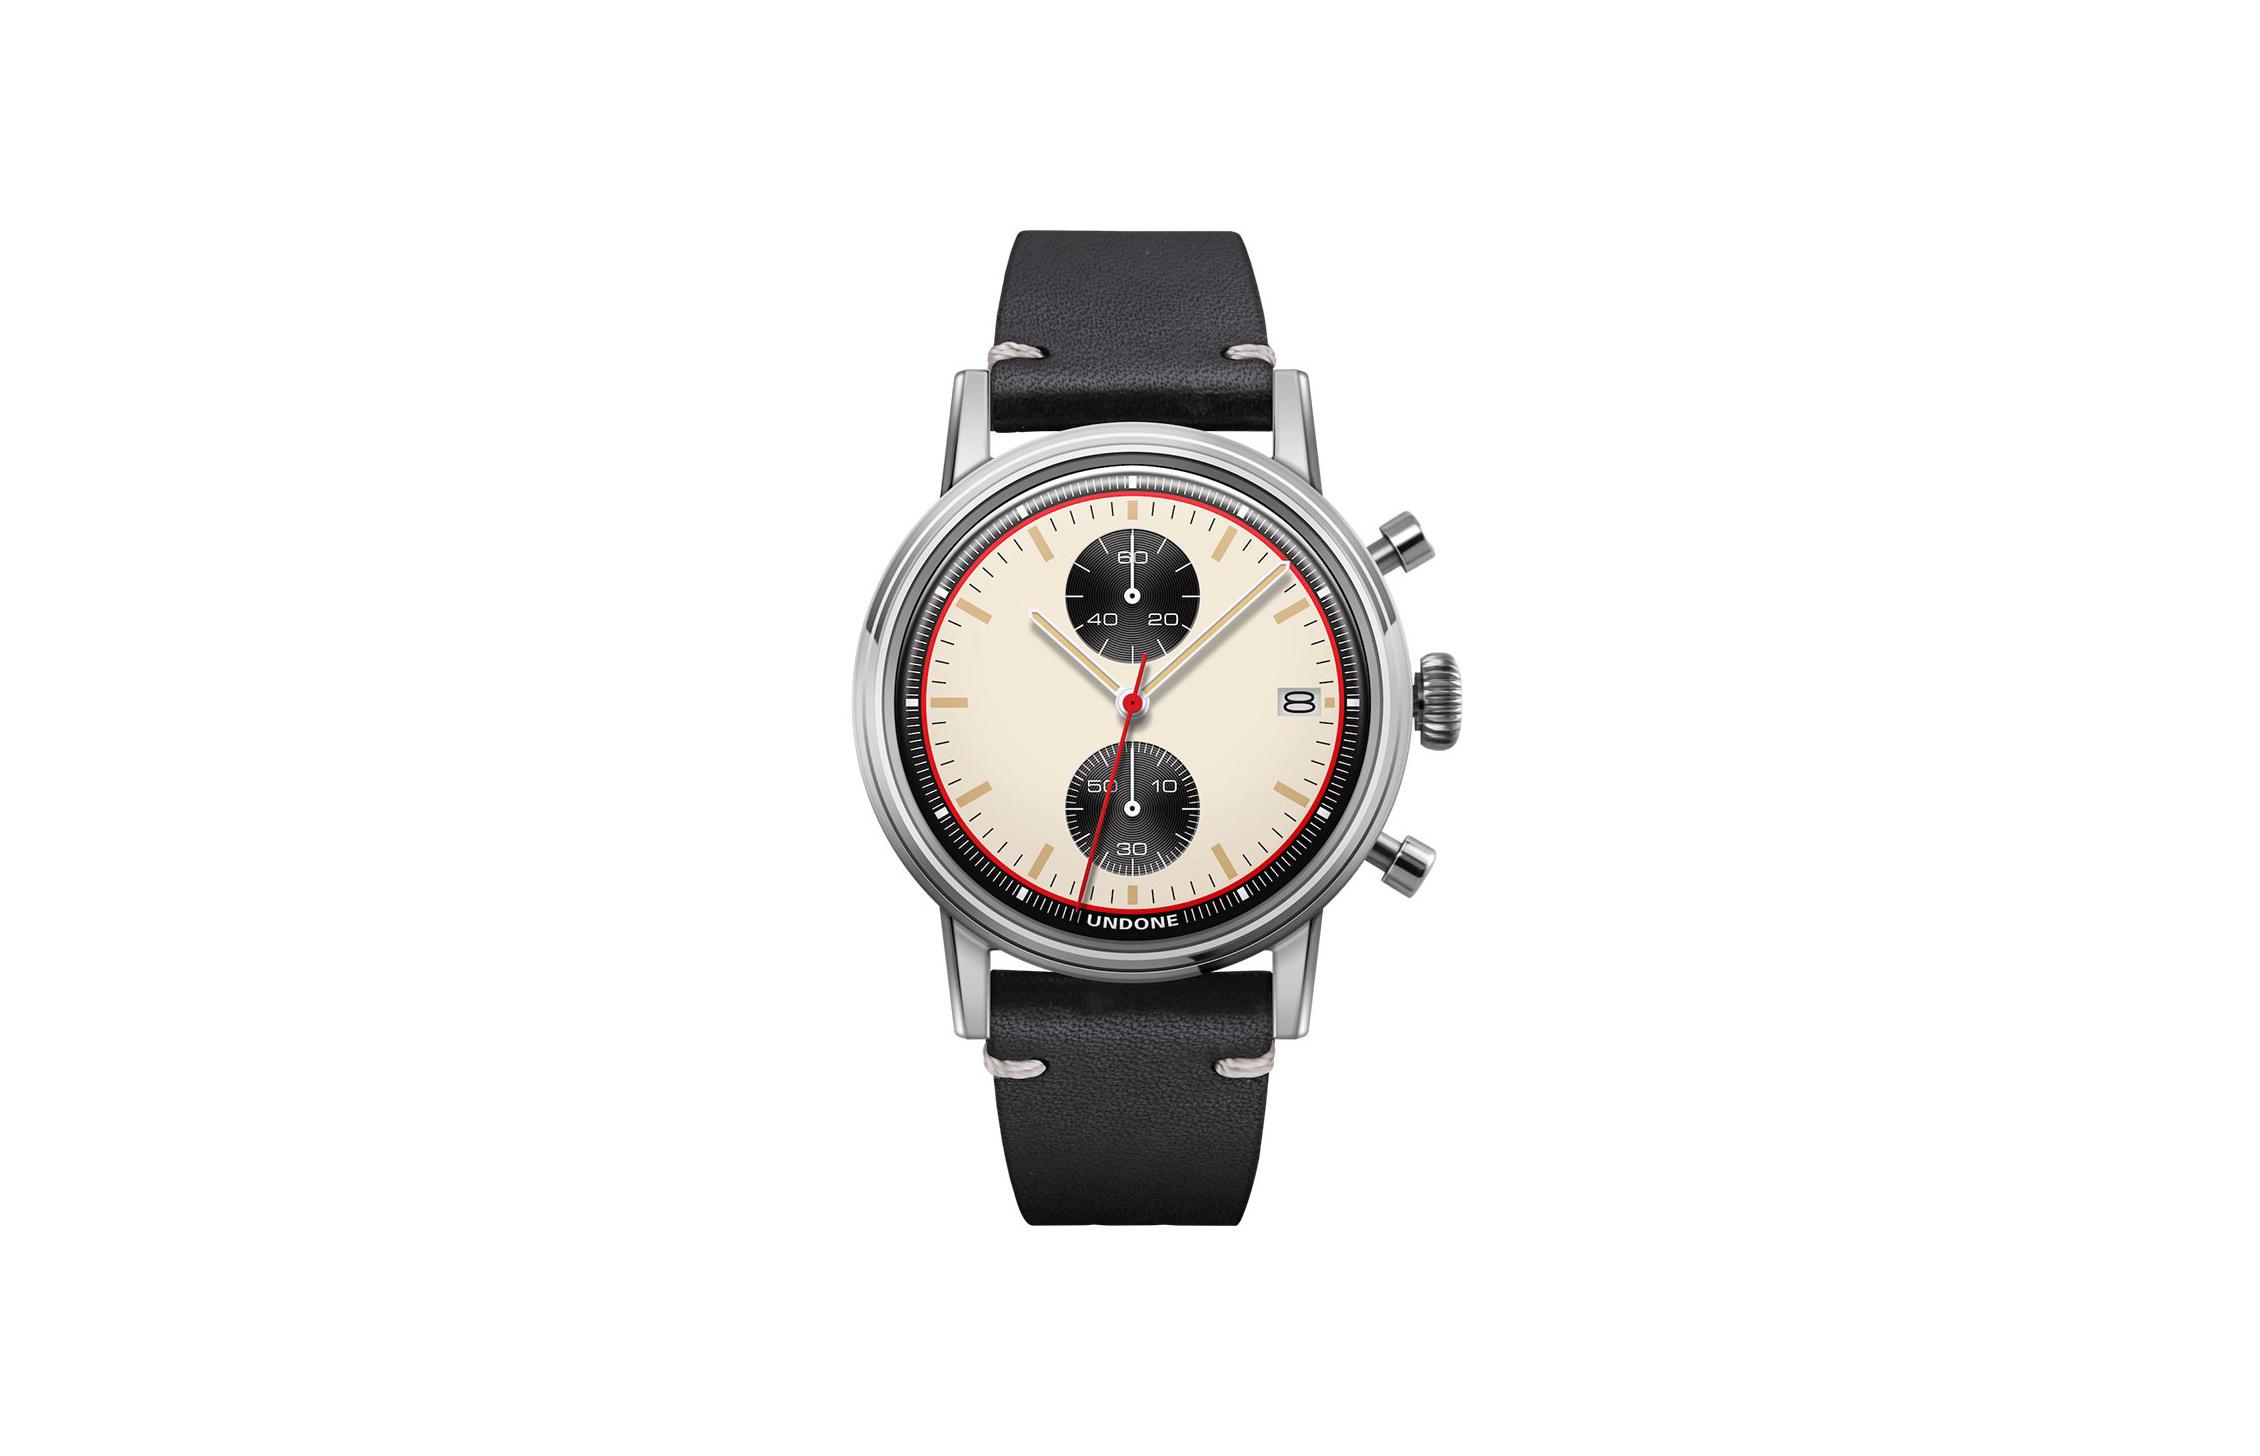 Undone Newman Chronograph Watch